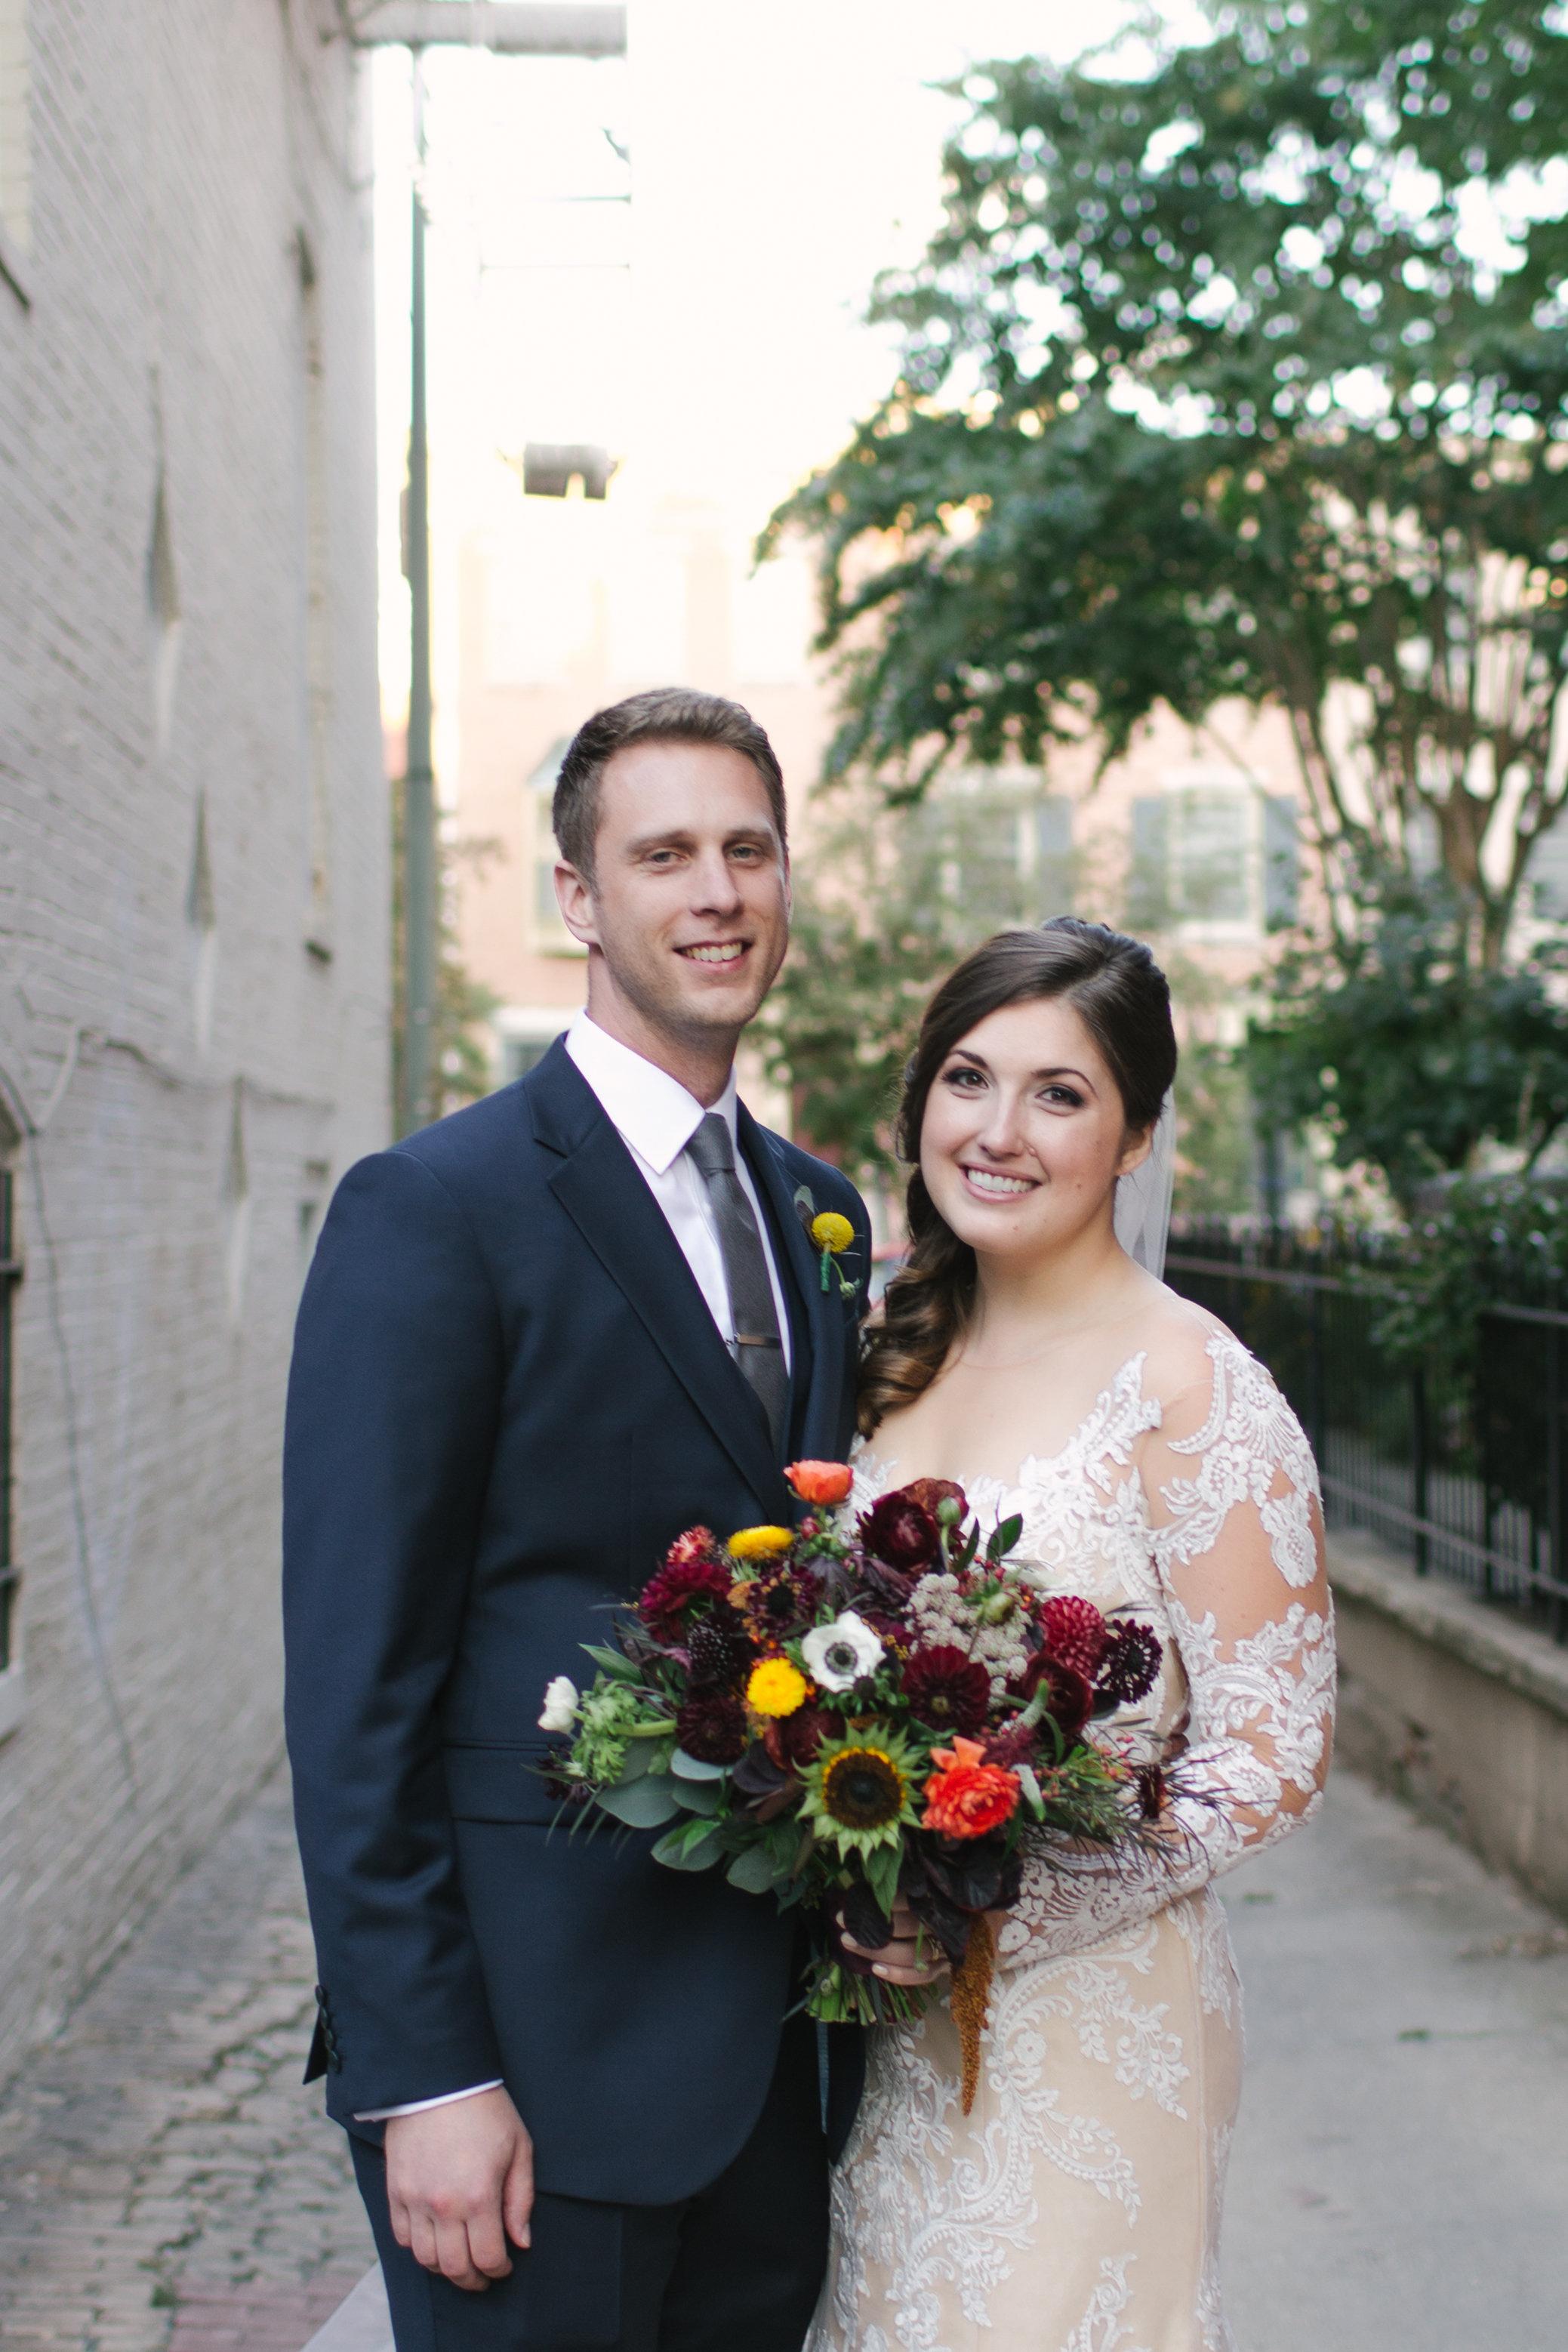 Dupon Circle Wedding | Washington DC Wedding Photography | Rebecca Wilcher Photography -14.jpg